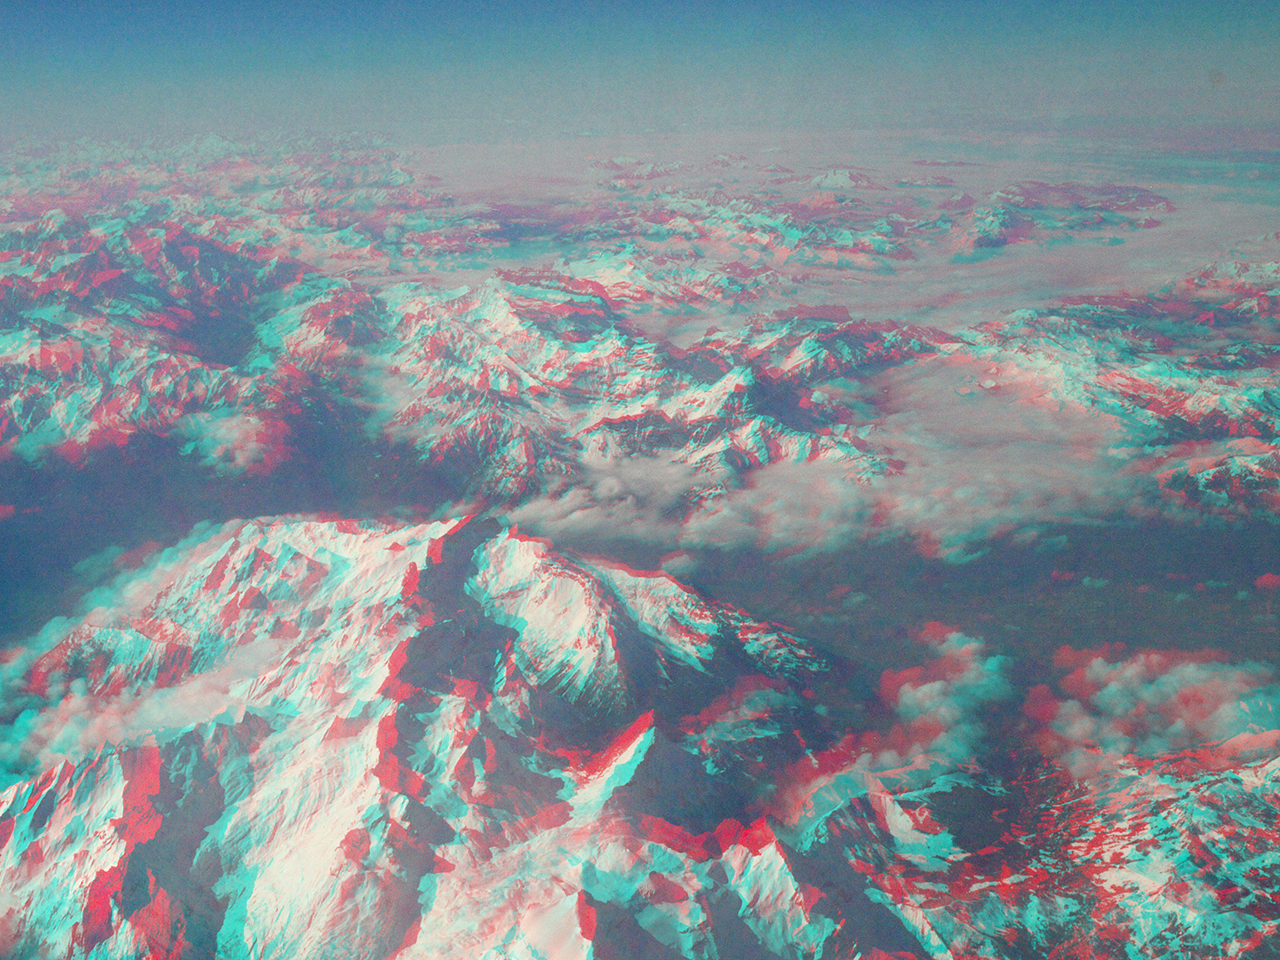 Alps In 3D  / Geena Matuson (@geenamatuson)